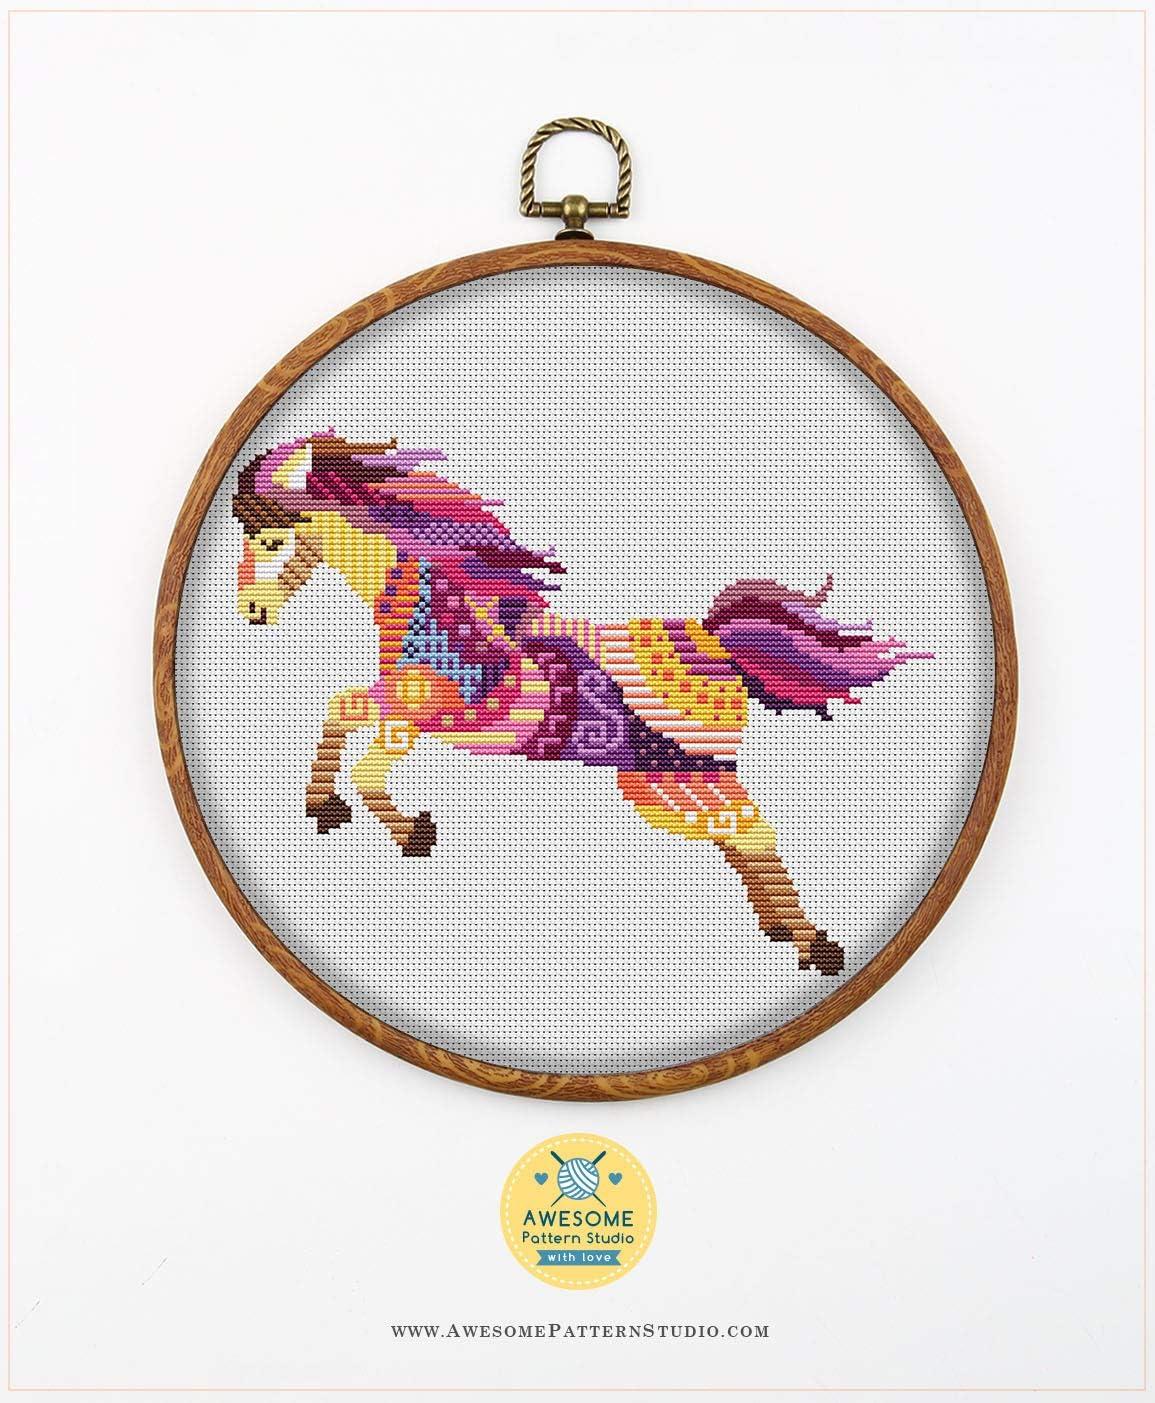 Cross Stitch Designs Embroidery Stitches Funny Animals Embroidery Kits Embroidery Designs Stitching Mandala Horse #K551 Cross Stitch Kit